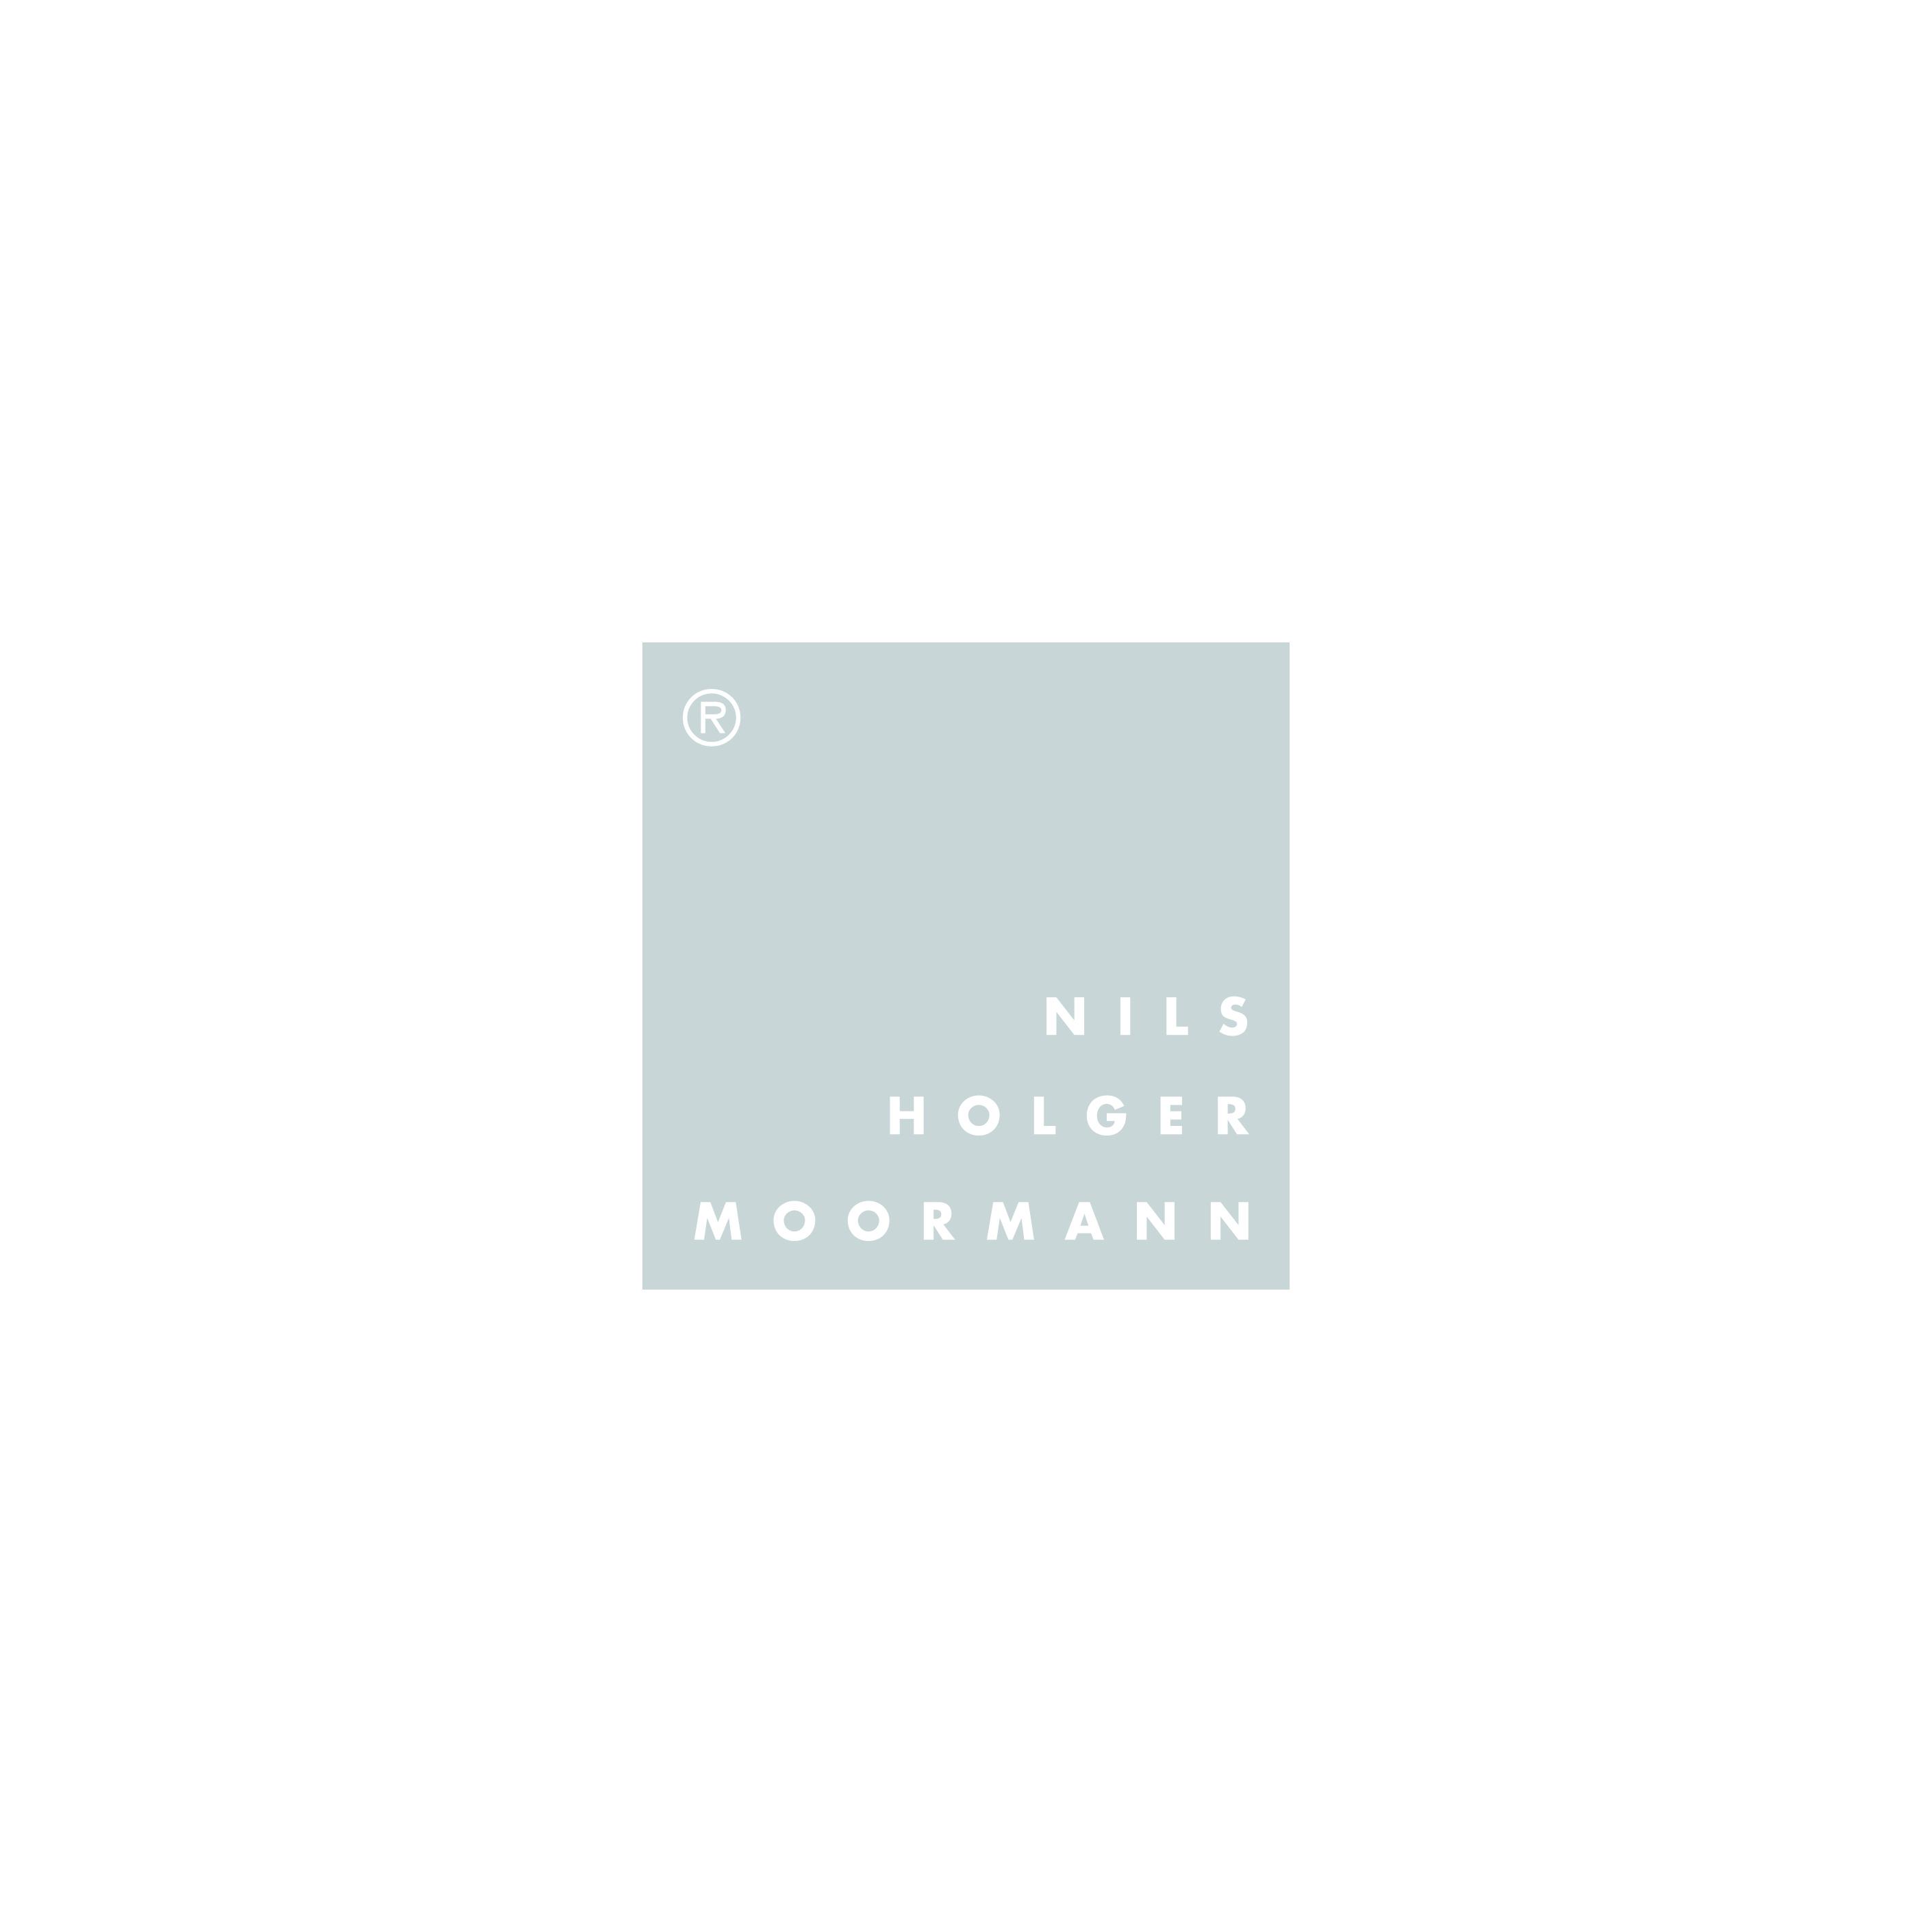 MOORMANN KLOPSTOCK TISCH (design: Daniel Kern 2013)